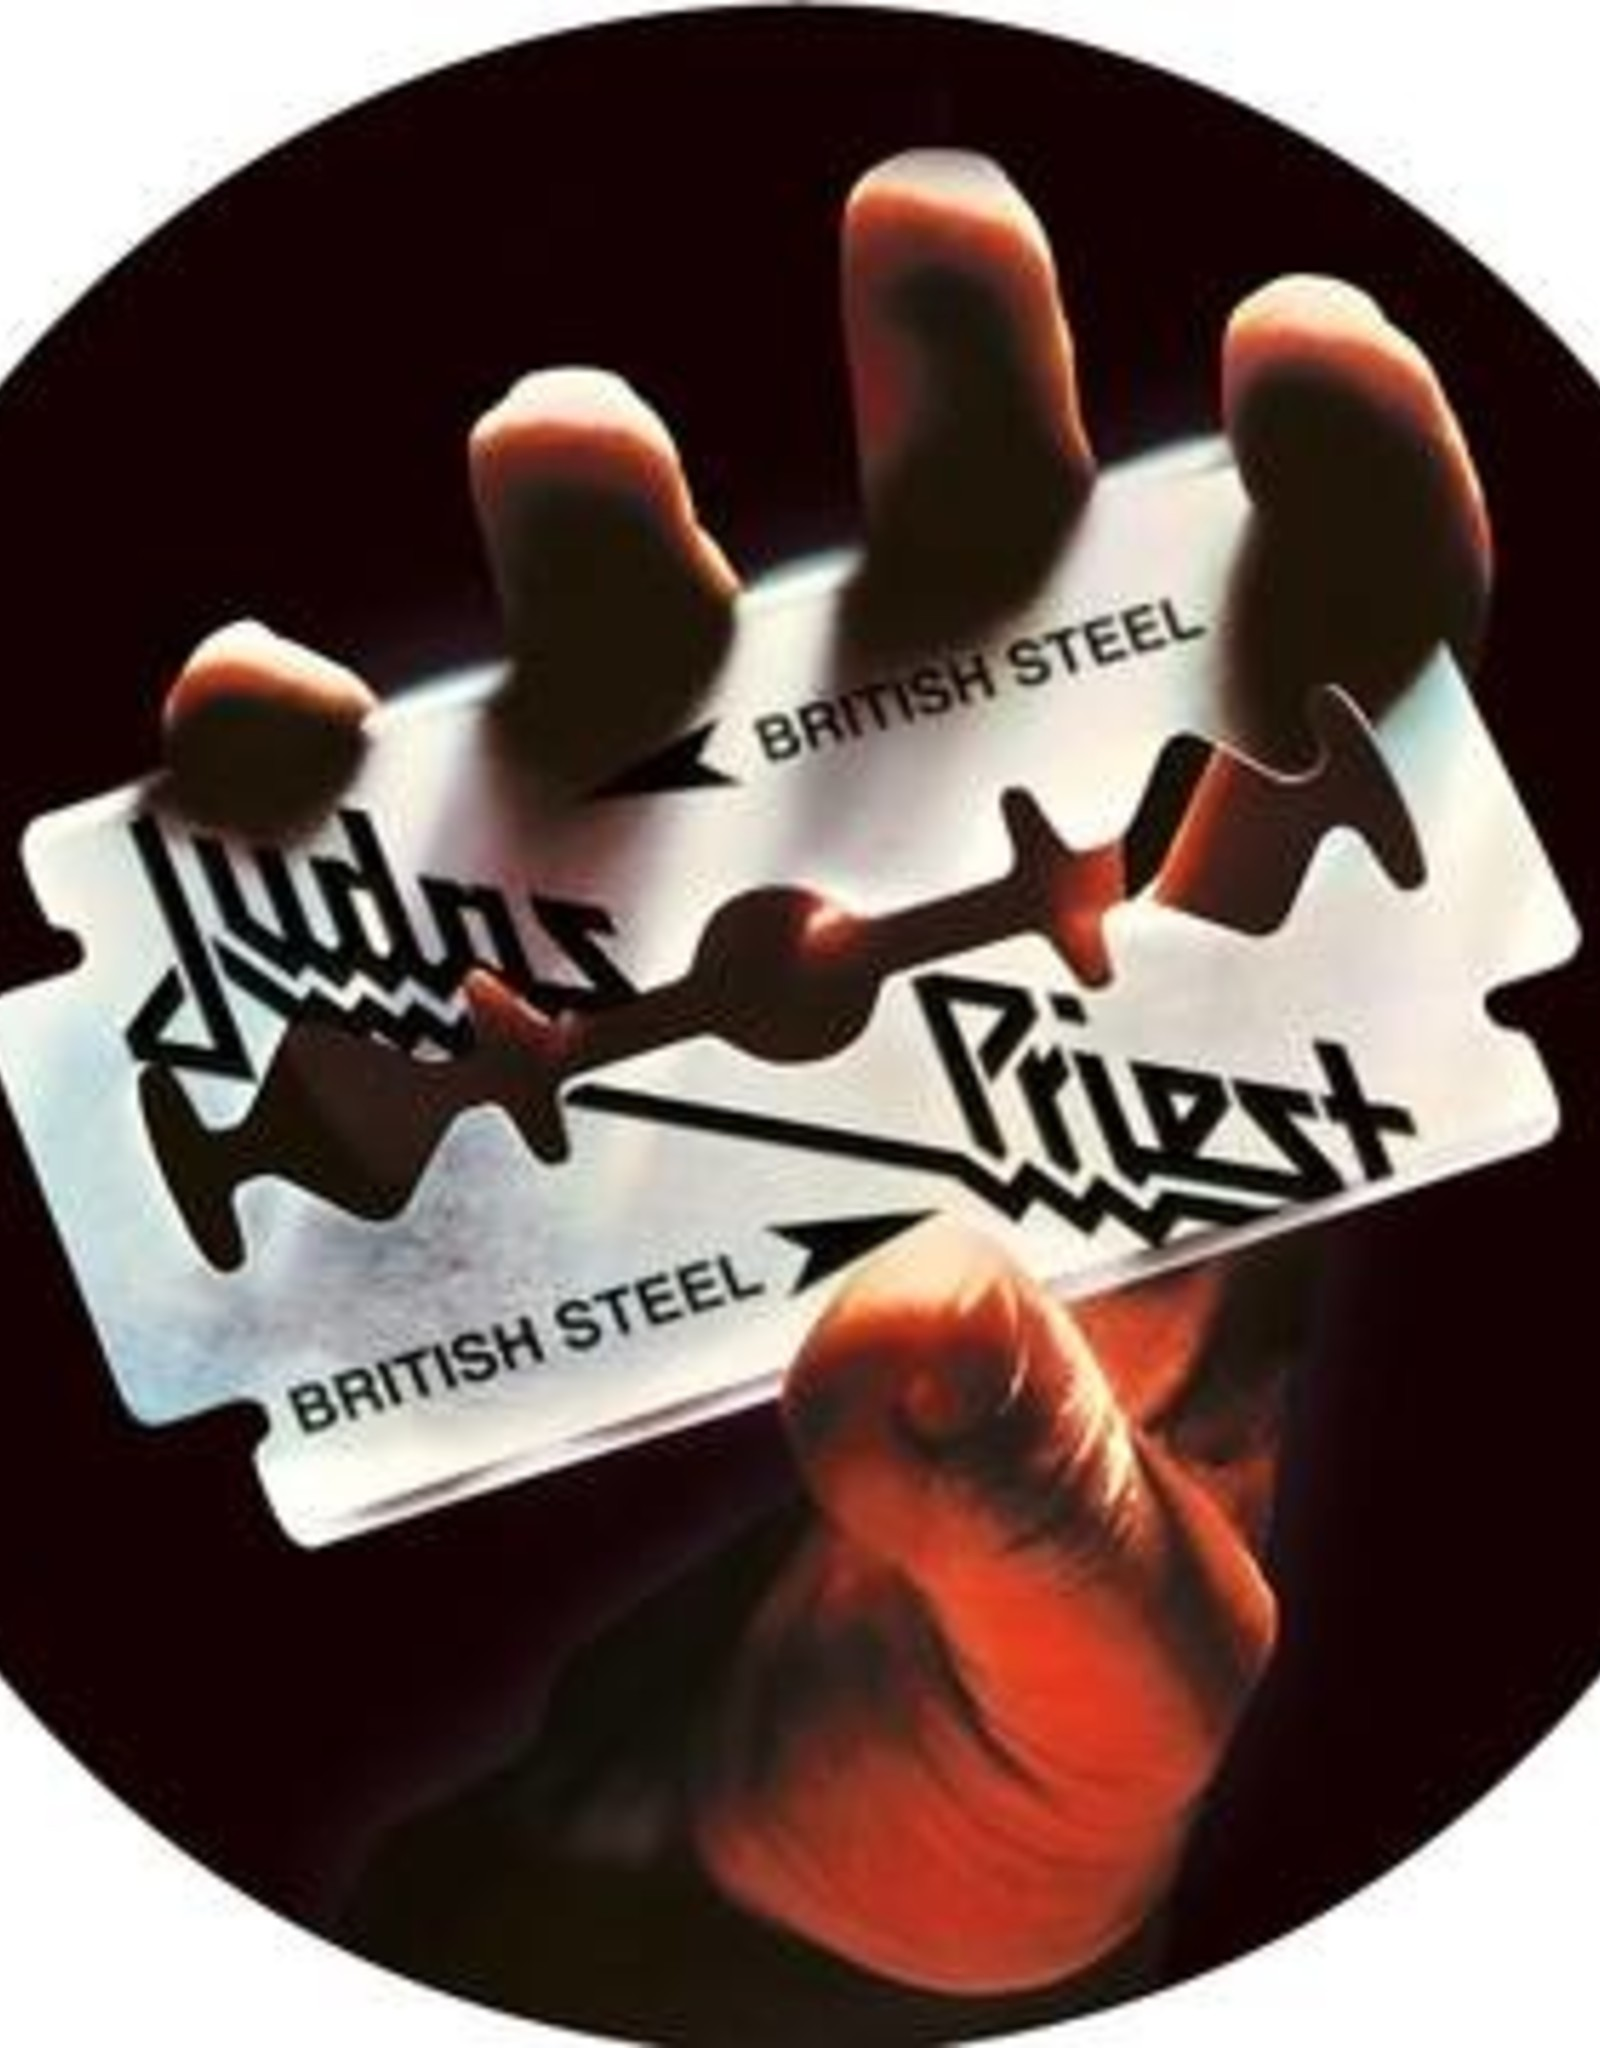 Judas Priest - British Steel - 40Th Anniversary (2Lp/140G/Marbled Vinyl/Dl Insert/Uv Imagesides B & D) (RSD 2020)